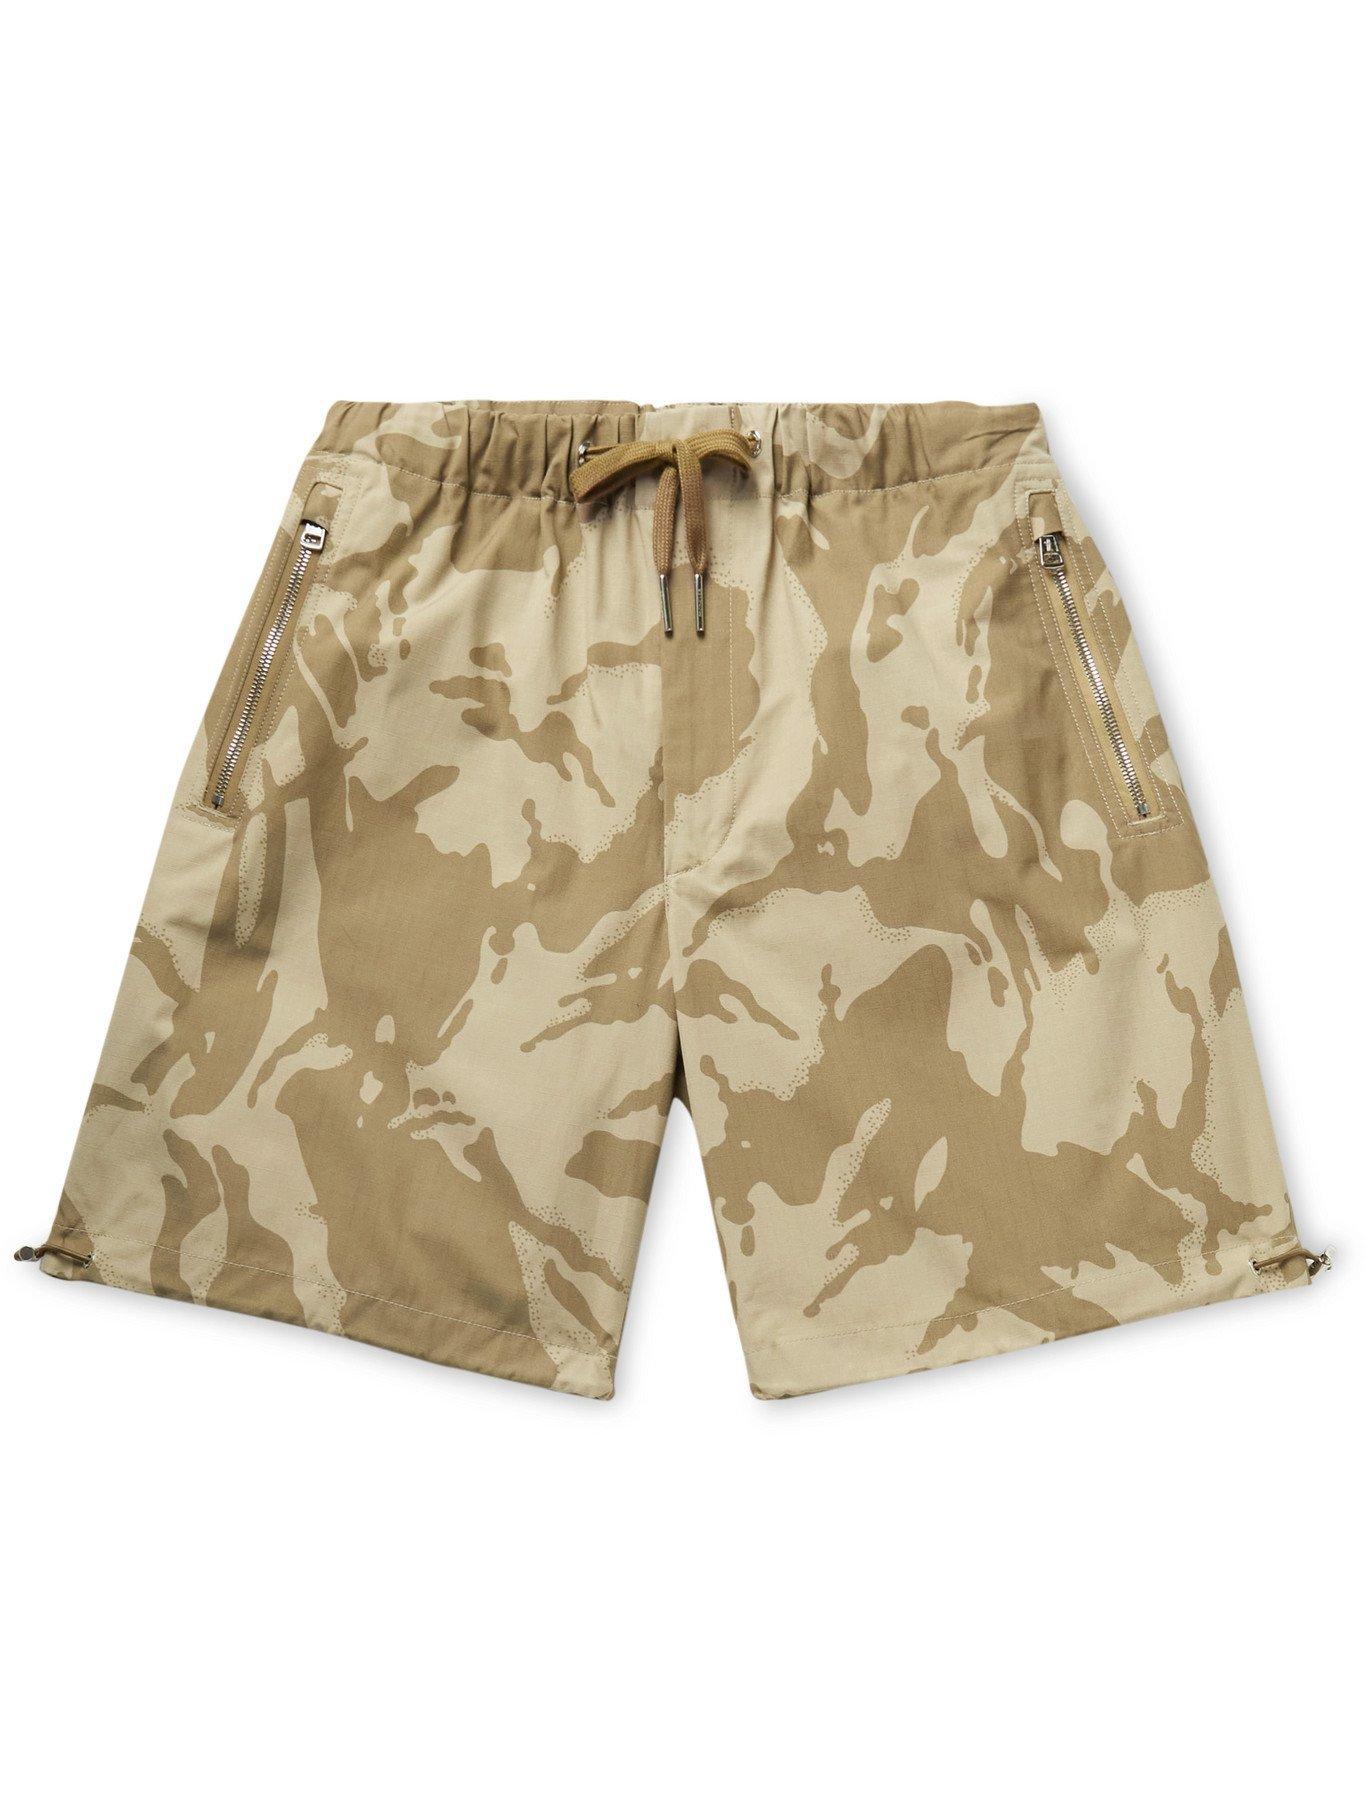 Photo: MONCLER - Camouflage-Print Cotton-Ripstop Drawstring Bermuda Shorts - Neutrals - IT 52